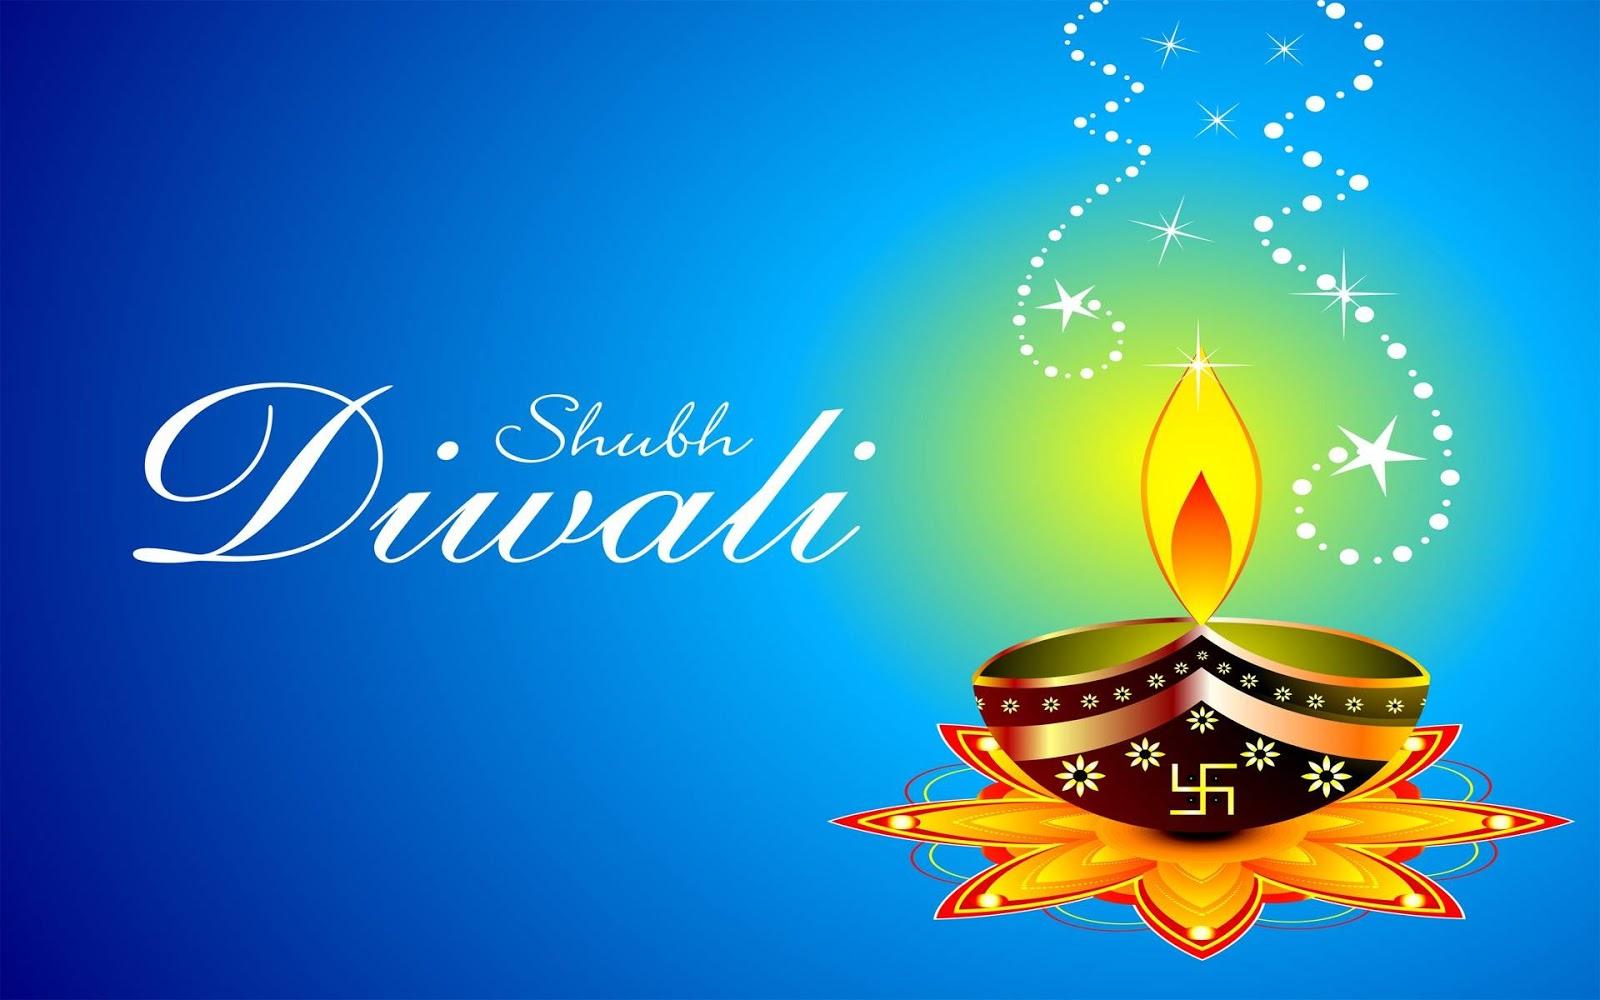 2018 Advance Happy Diwali Wishes Sms Shayari Whatsapp Status Messages